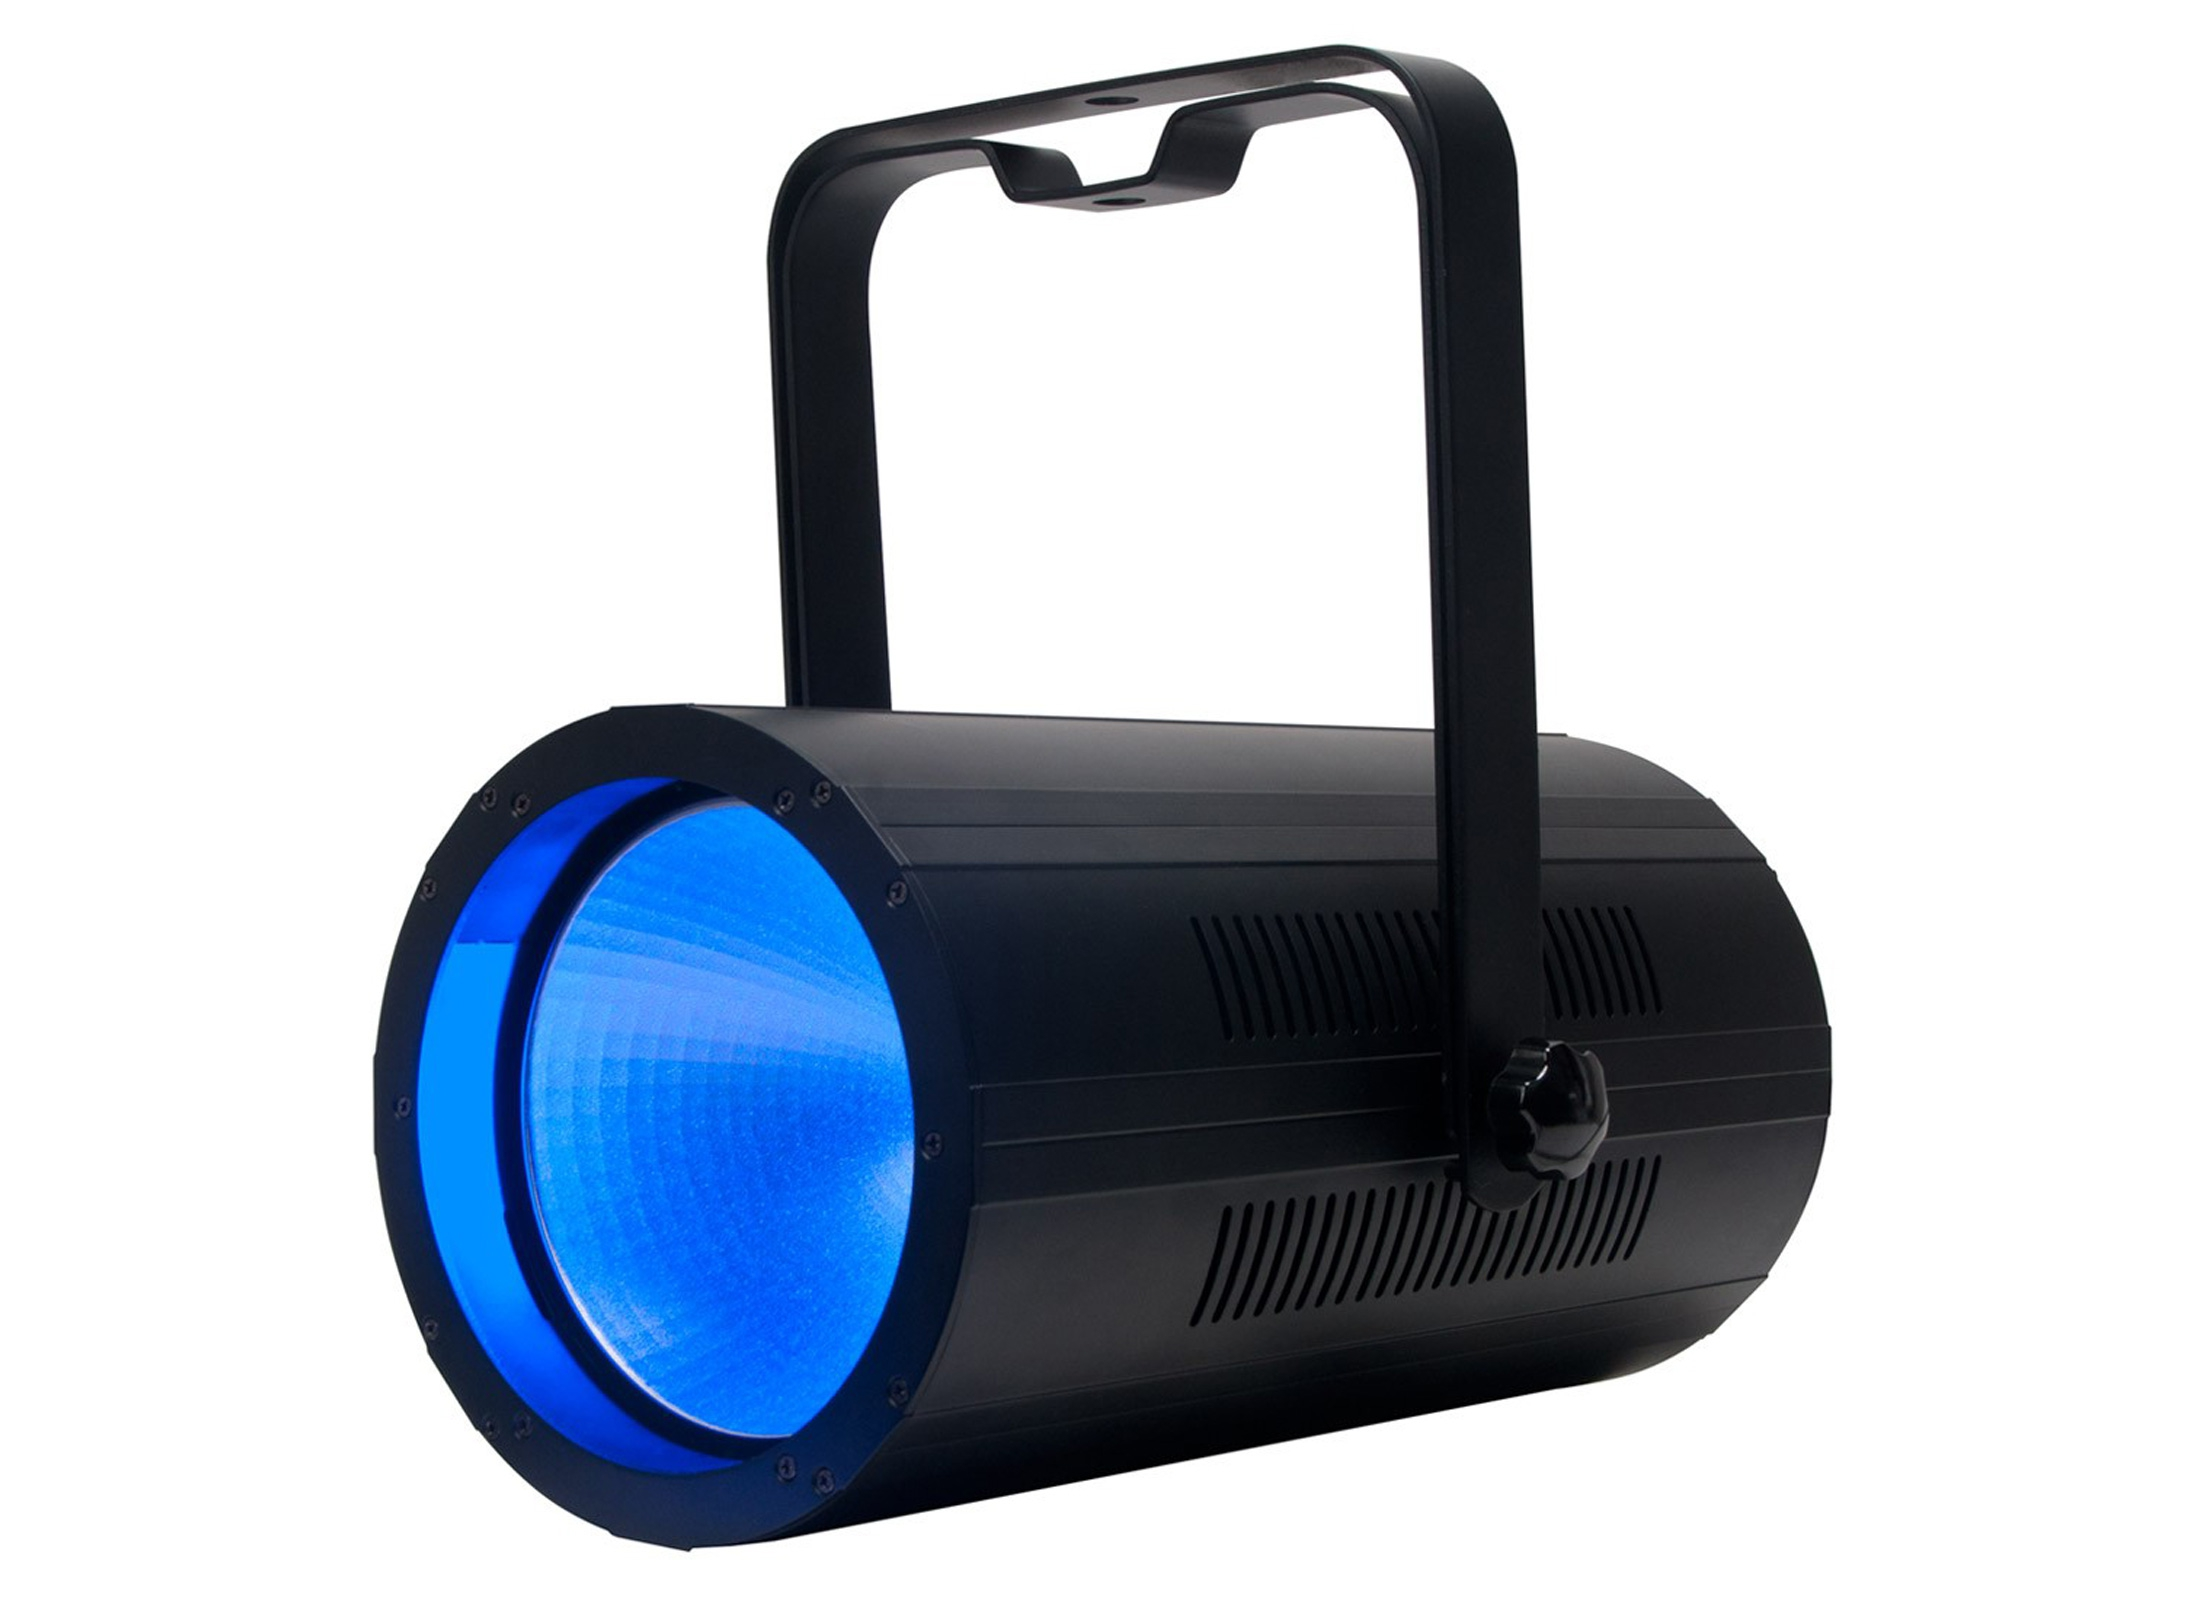 american dj cob cannon wash led mini par scheinwerfer. Black Bedroom Furniture Sets. Home Design Ideas